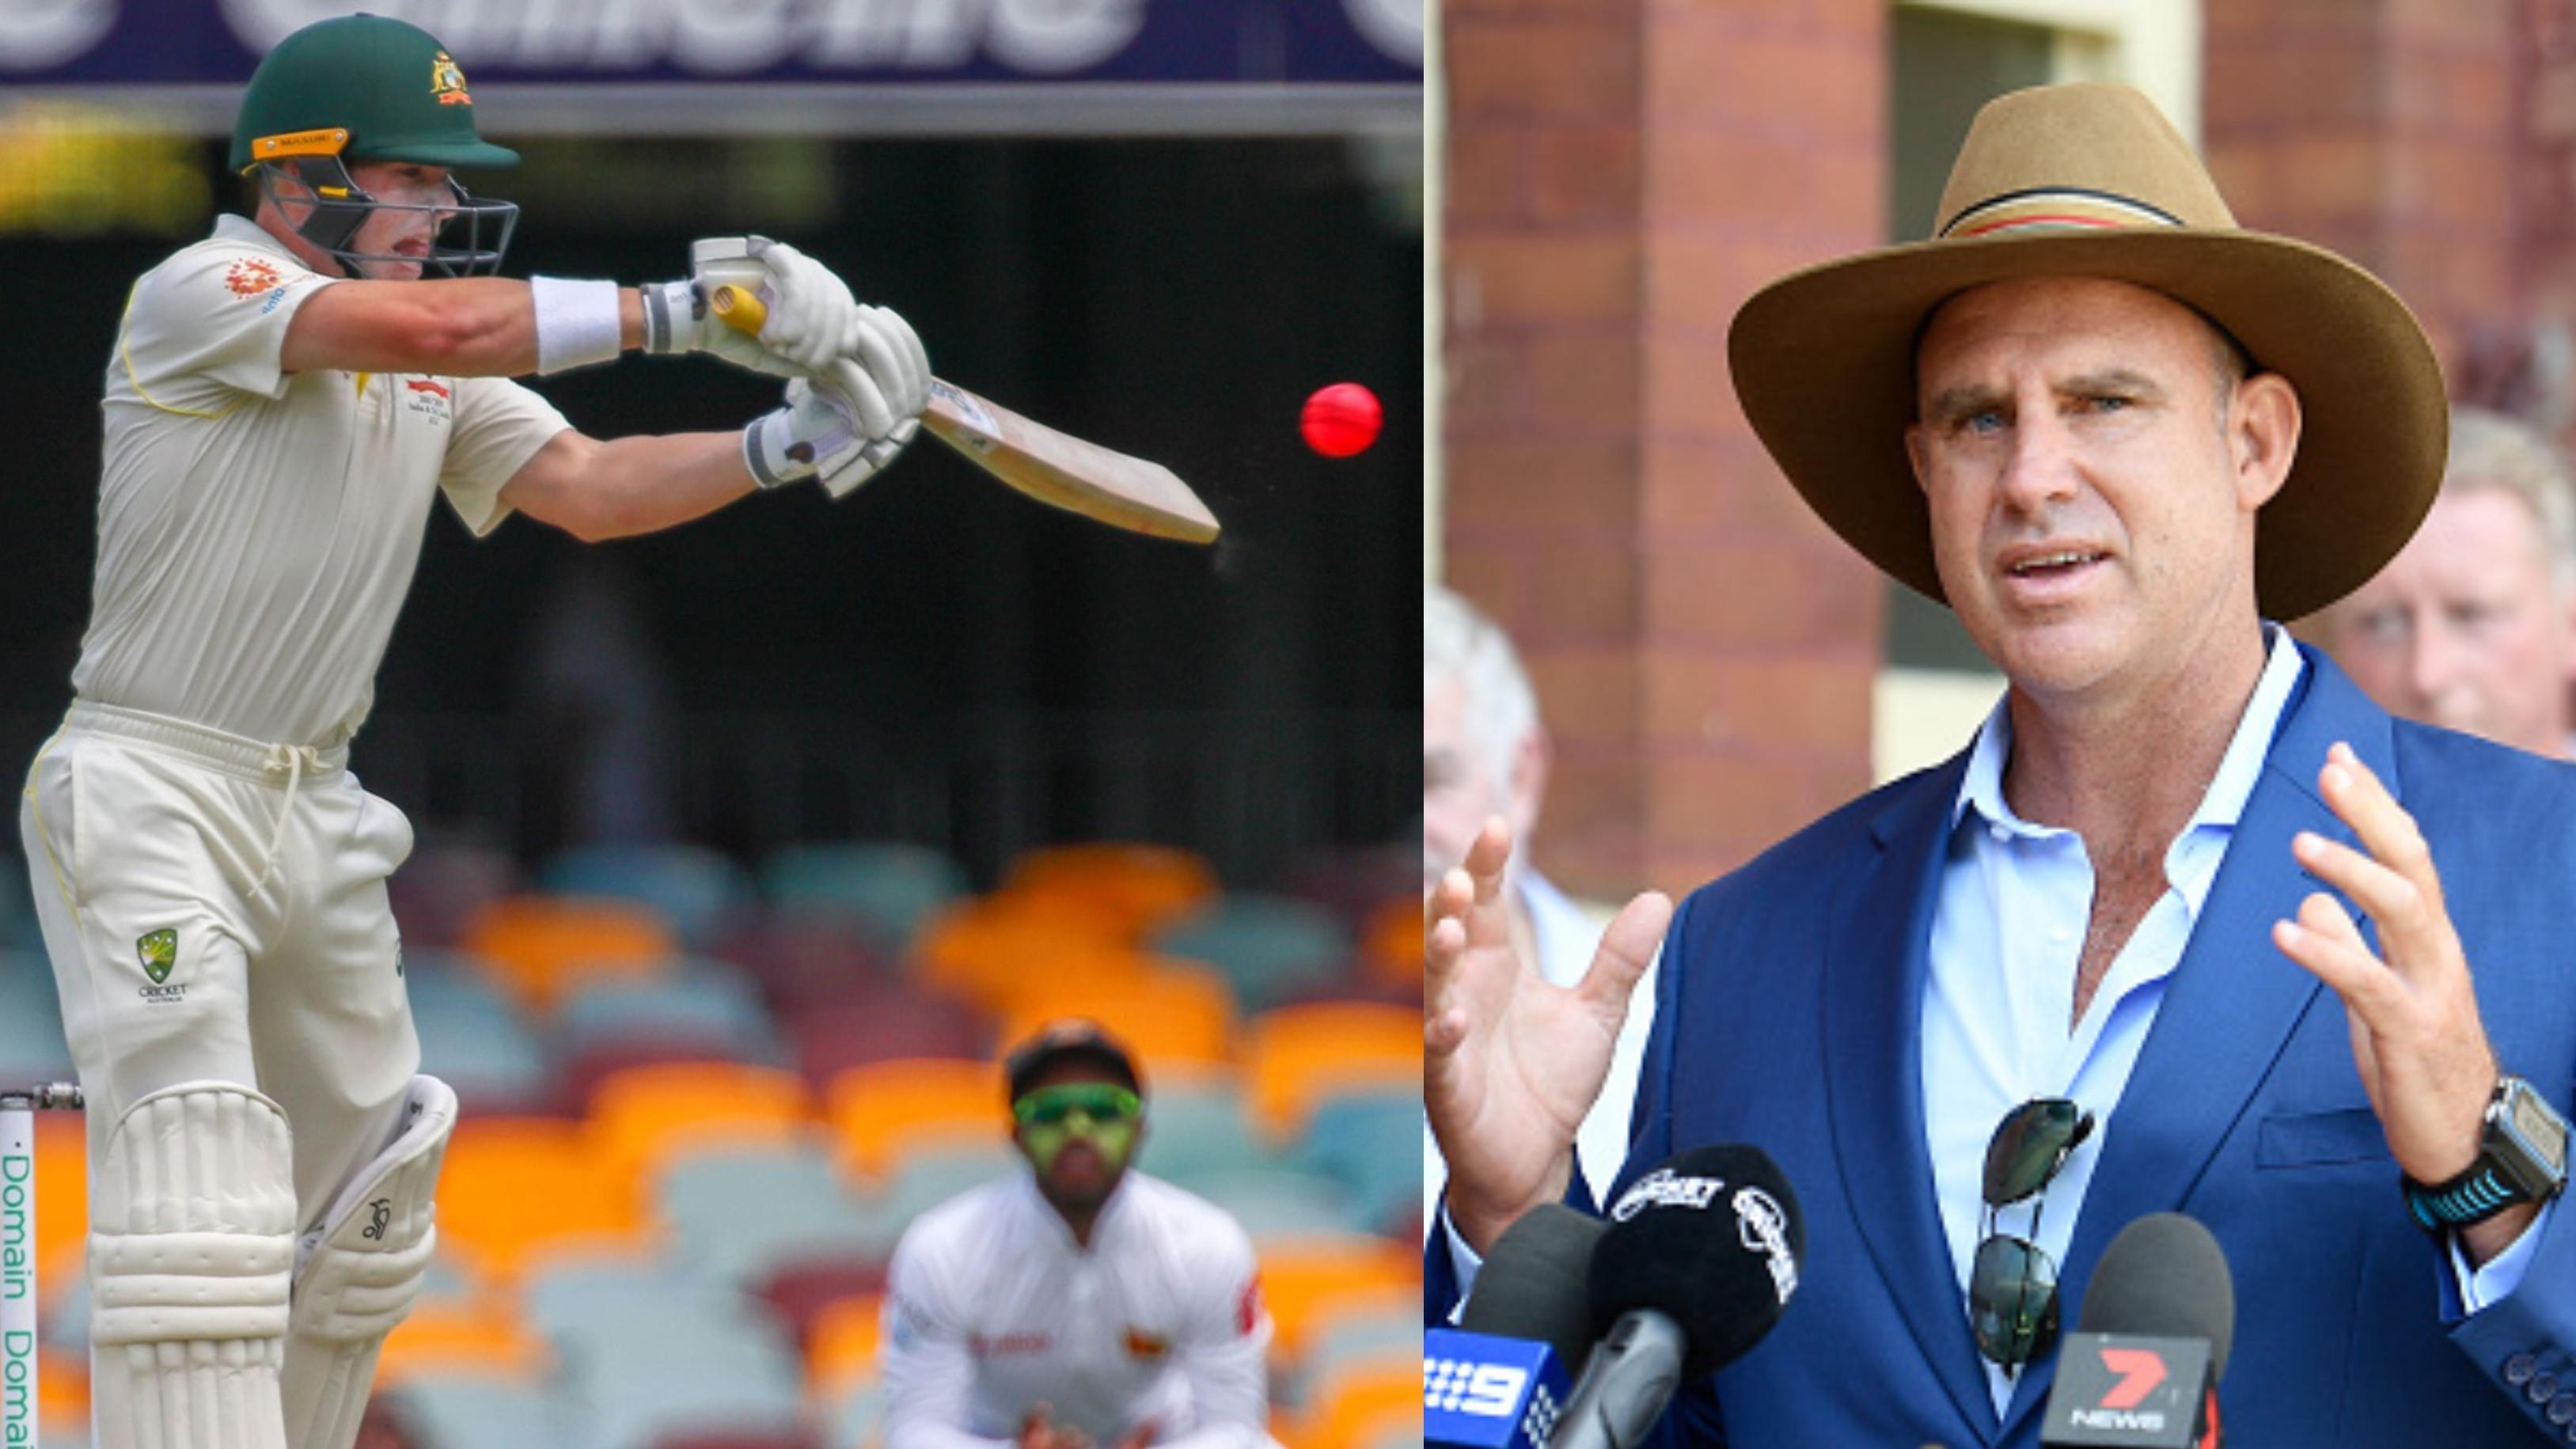 AUS v SL 2019: Matthew Hayden's crucial advice for Marcus Harris